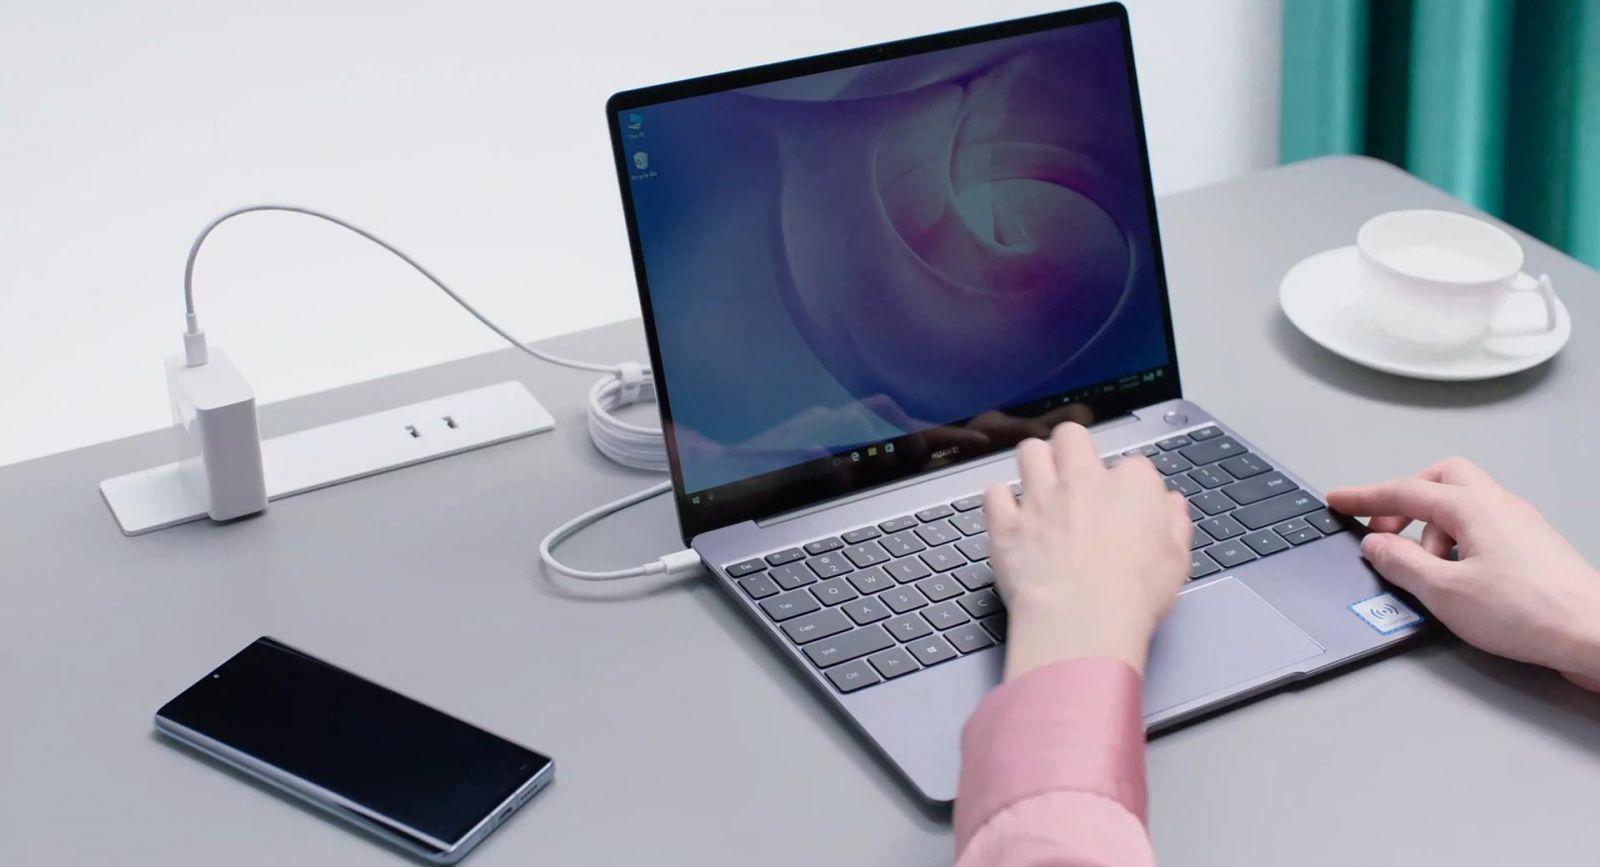 Huawei MateBook 13 с процессором AMD добрался до России (huawei matebook 13 charger video)